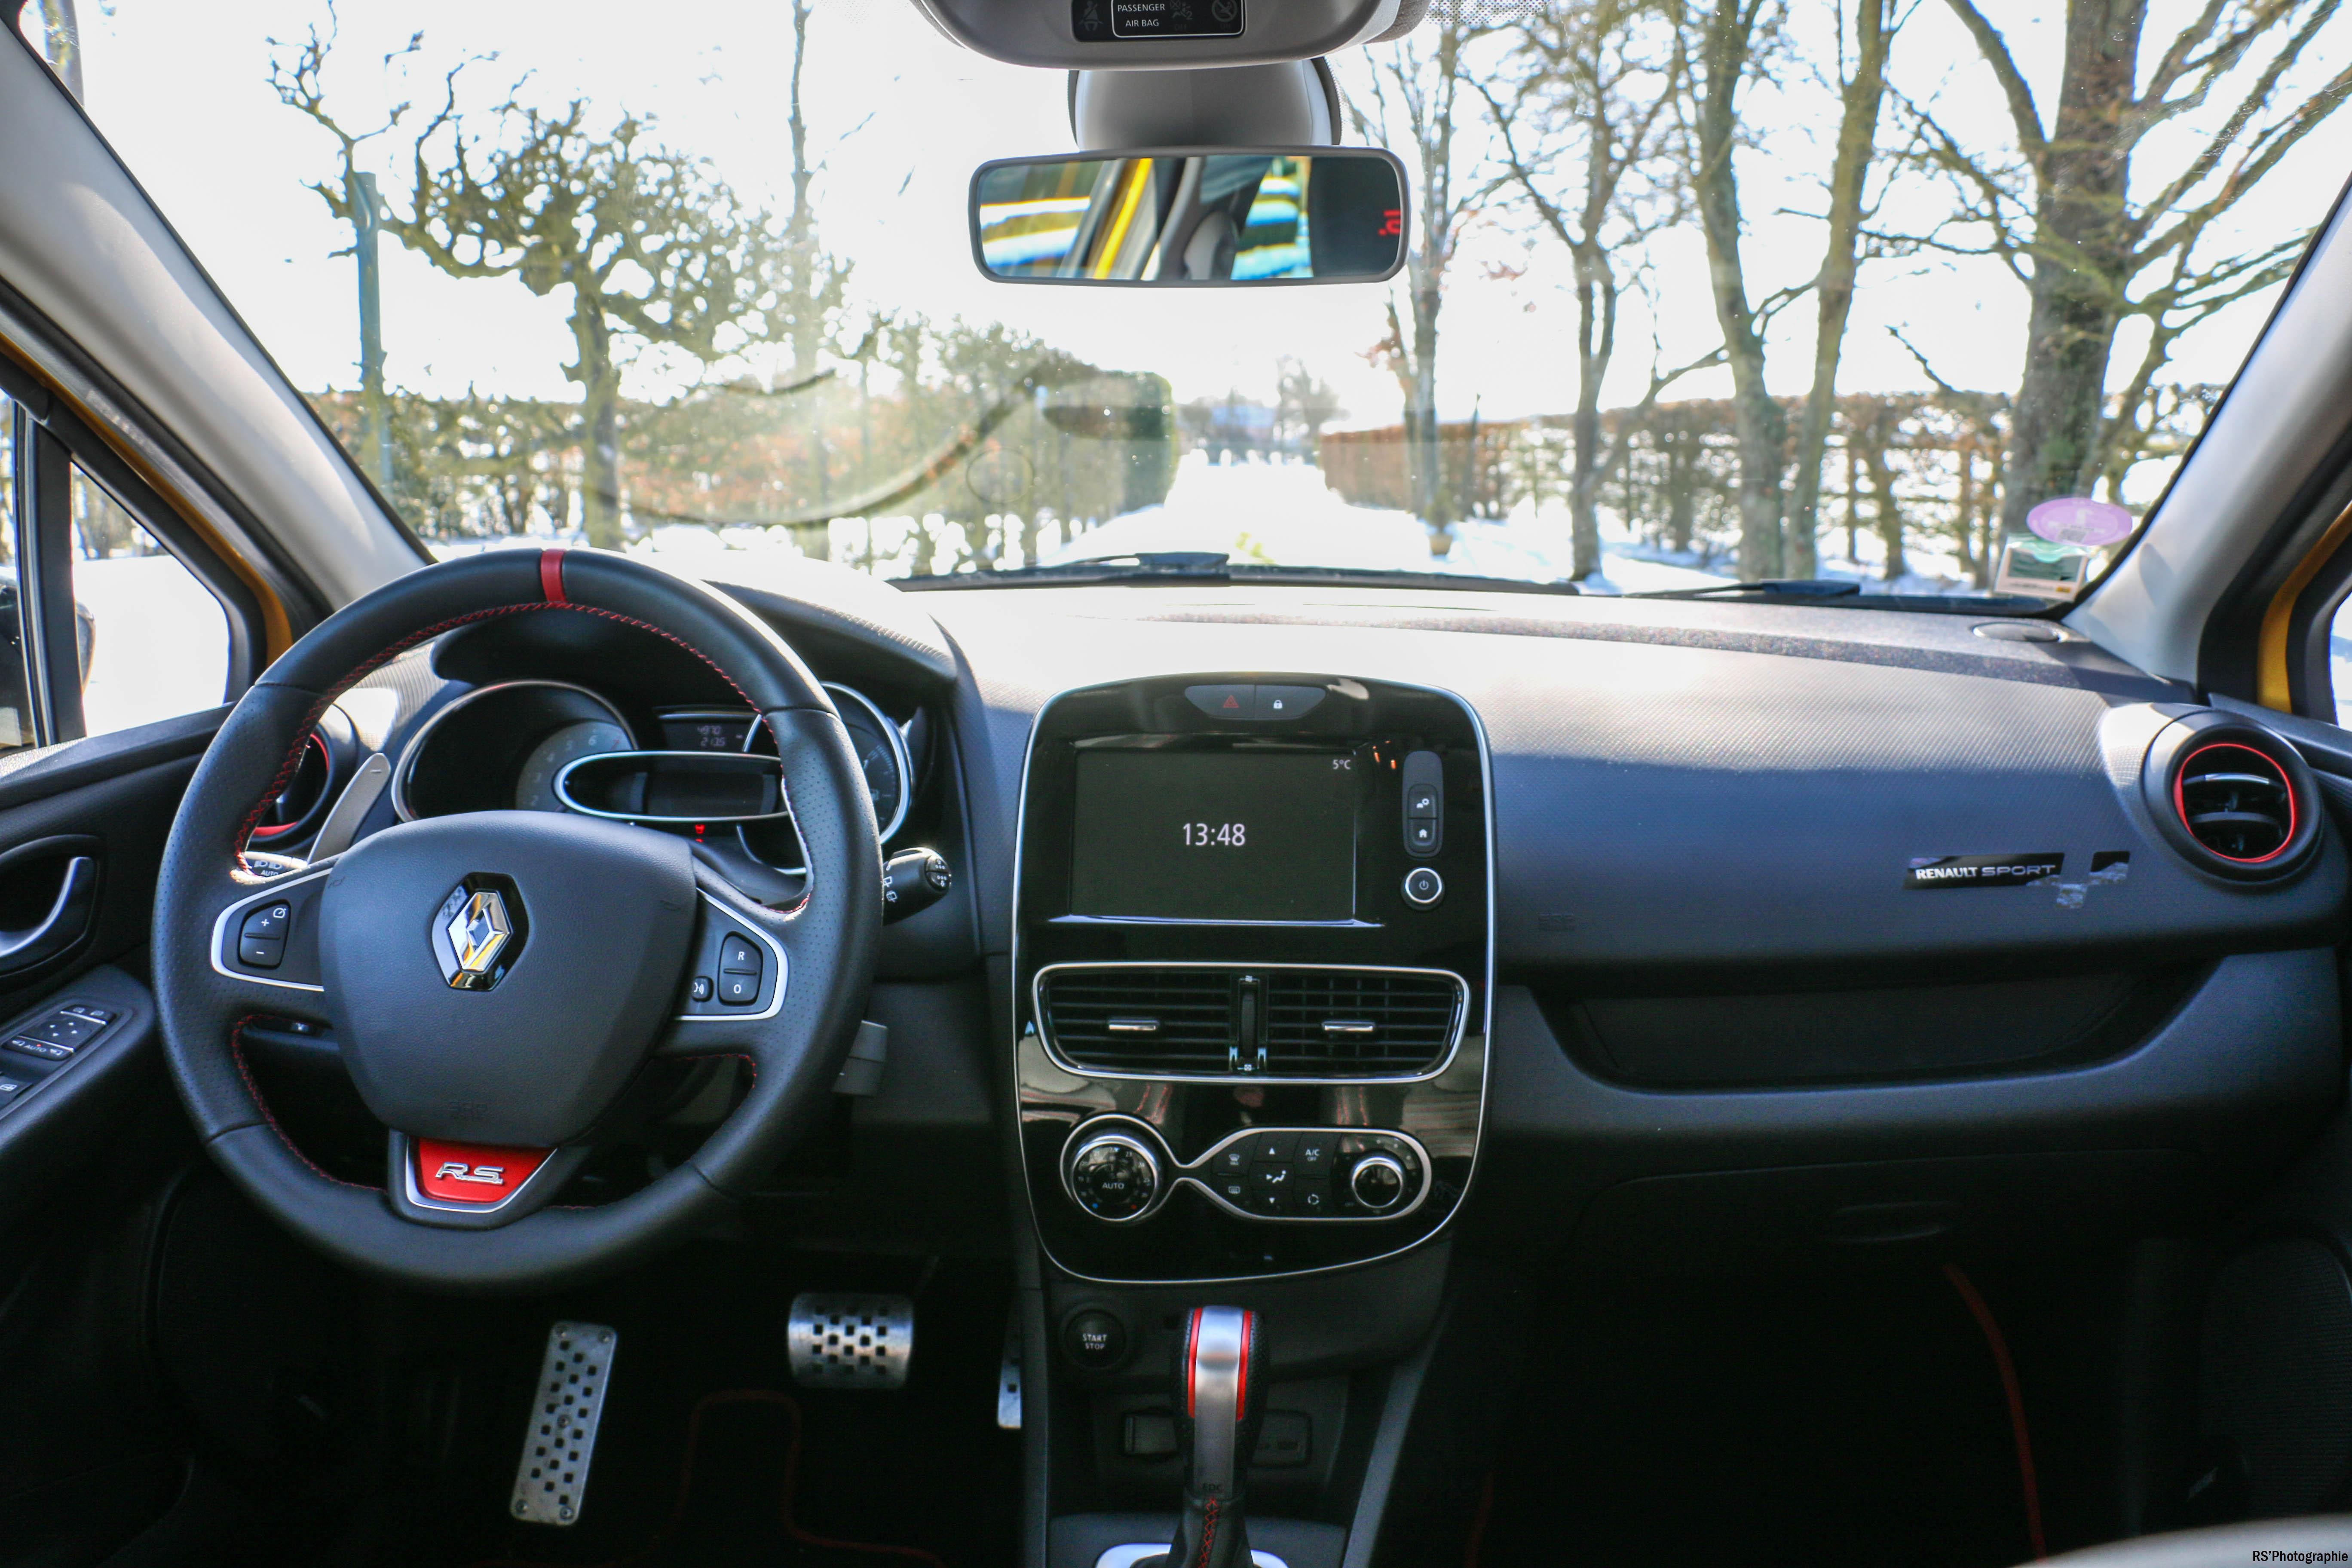 RenaultclioIVRSTrophy30-renault-clio-RS-trophy-intérieur-onboard-Arnaud Demasier-RSPhotographie